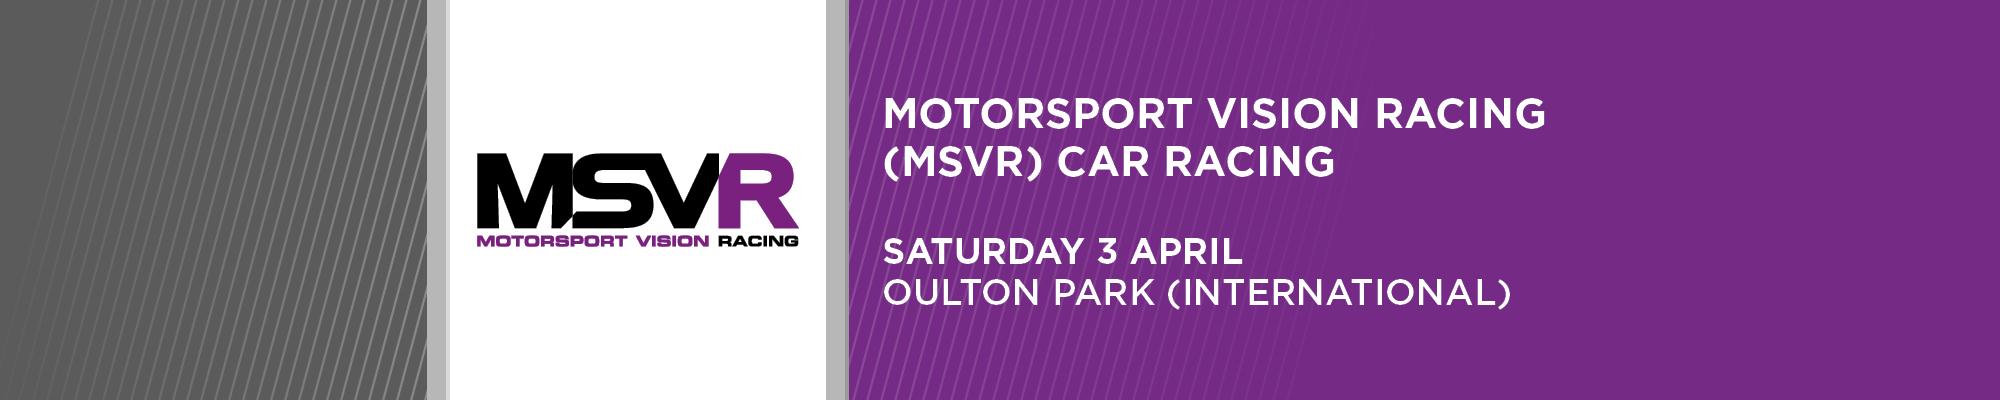 MSVR Club Car Championships- NO SPECTATORS